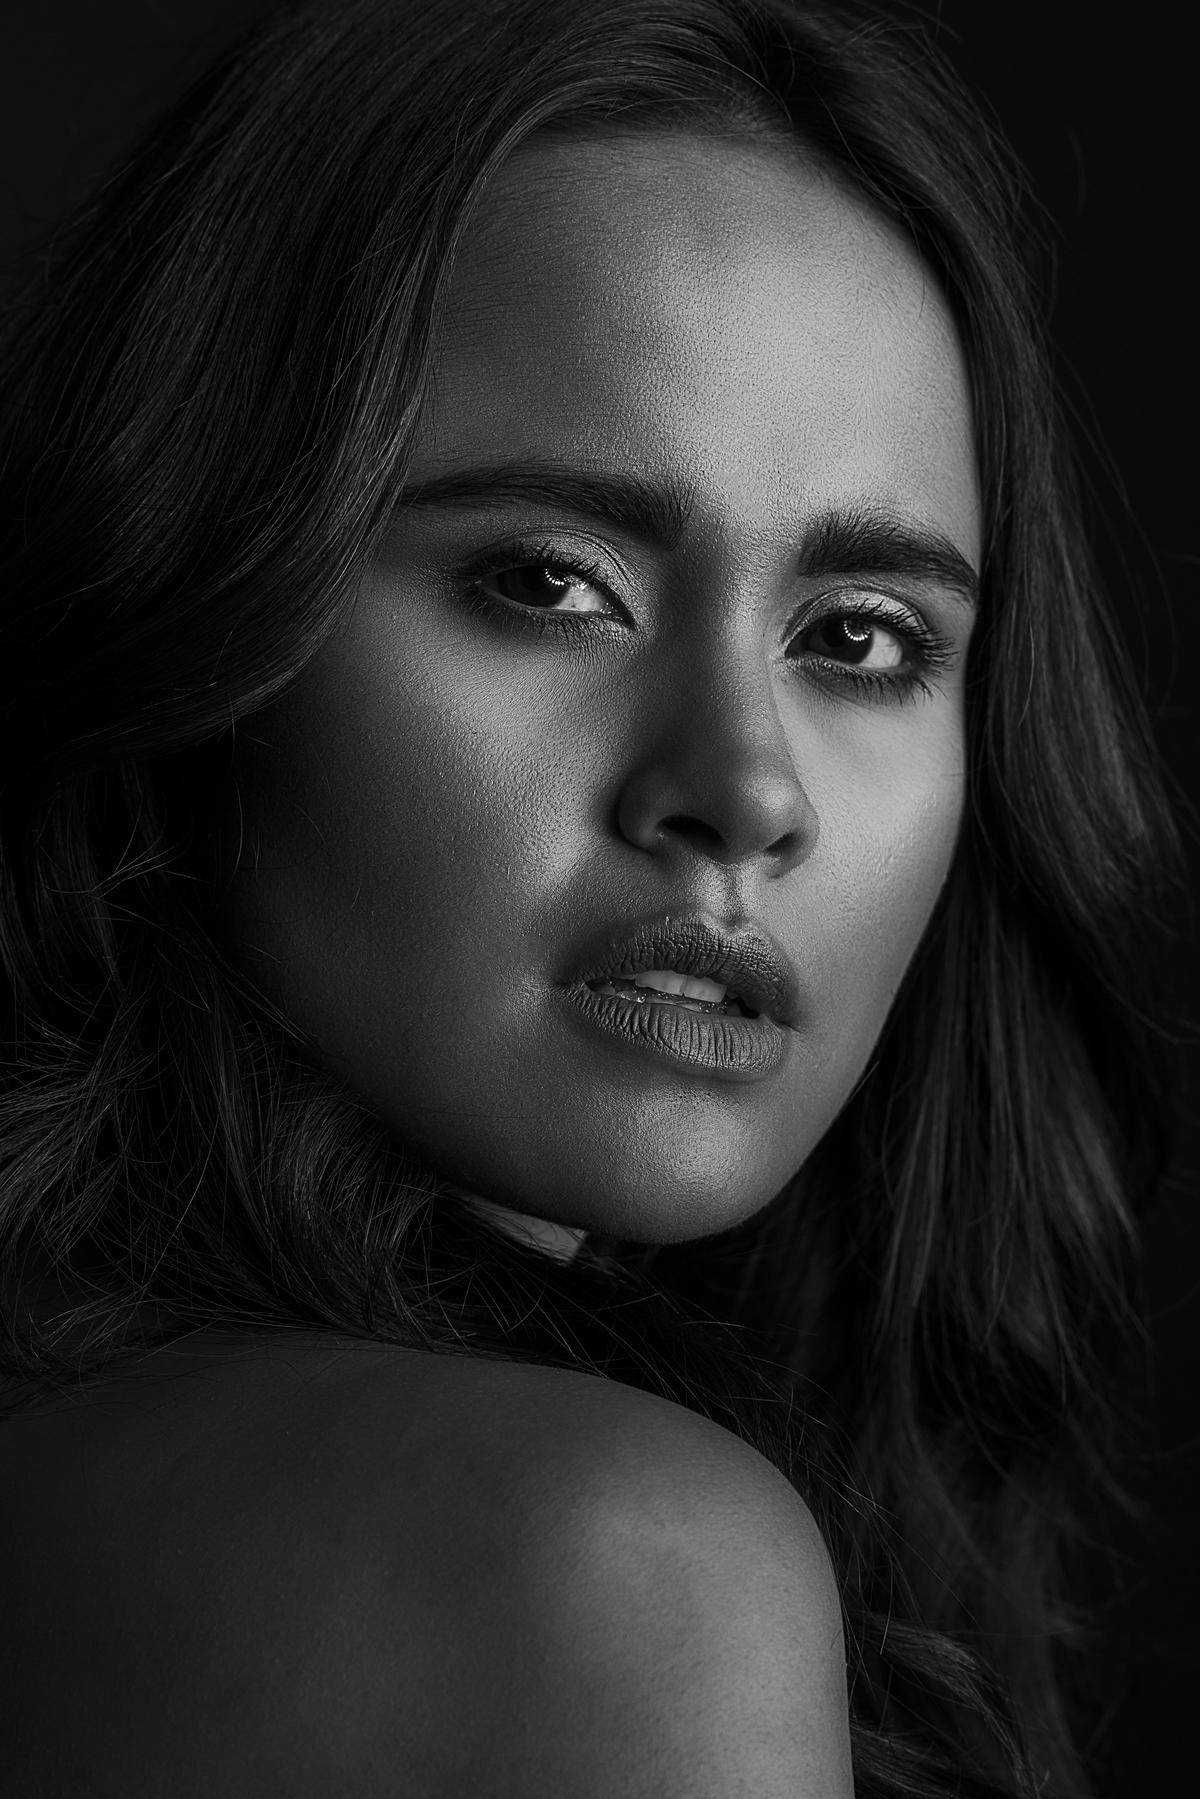 Image of Photo shoot, Black-and-white, Eyebrow, Model, Beauty, Black etc.